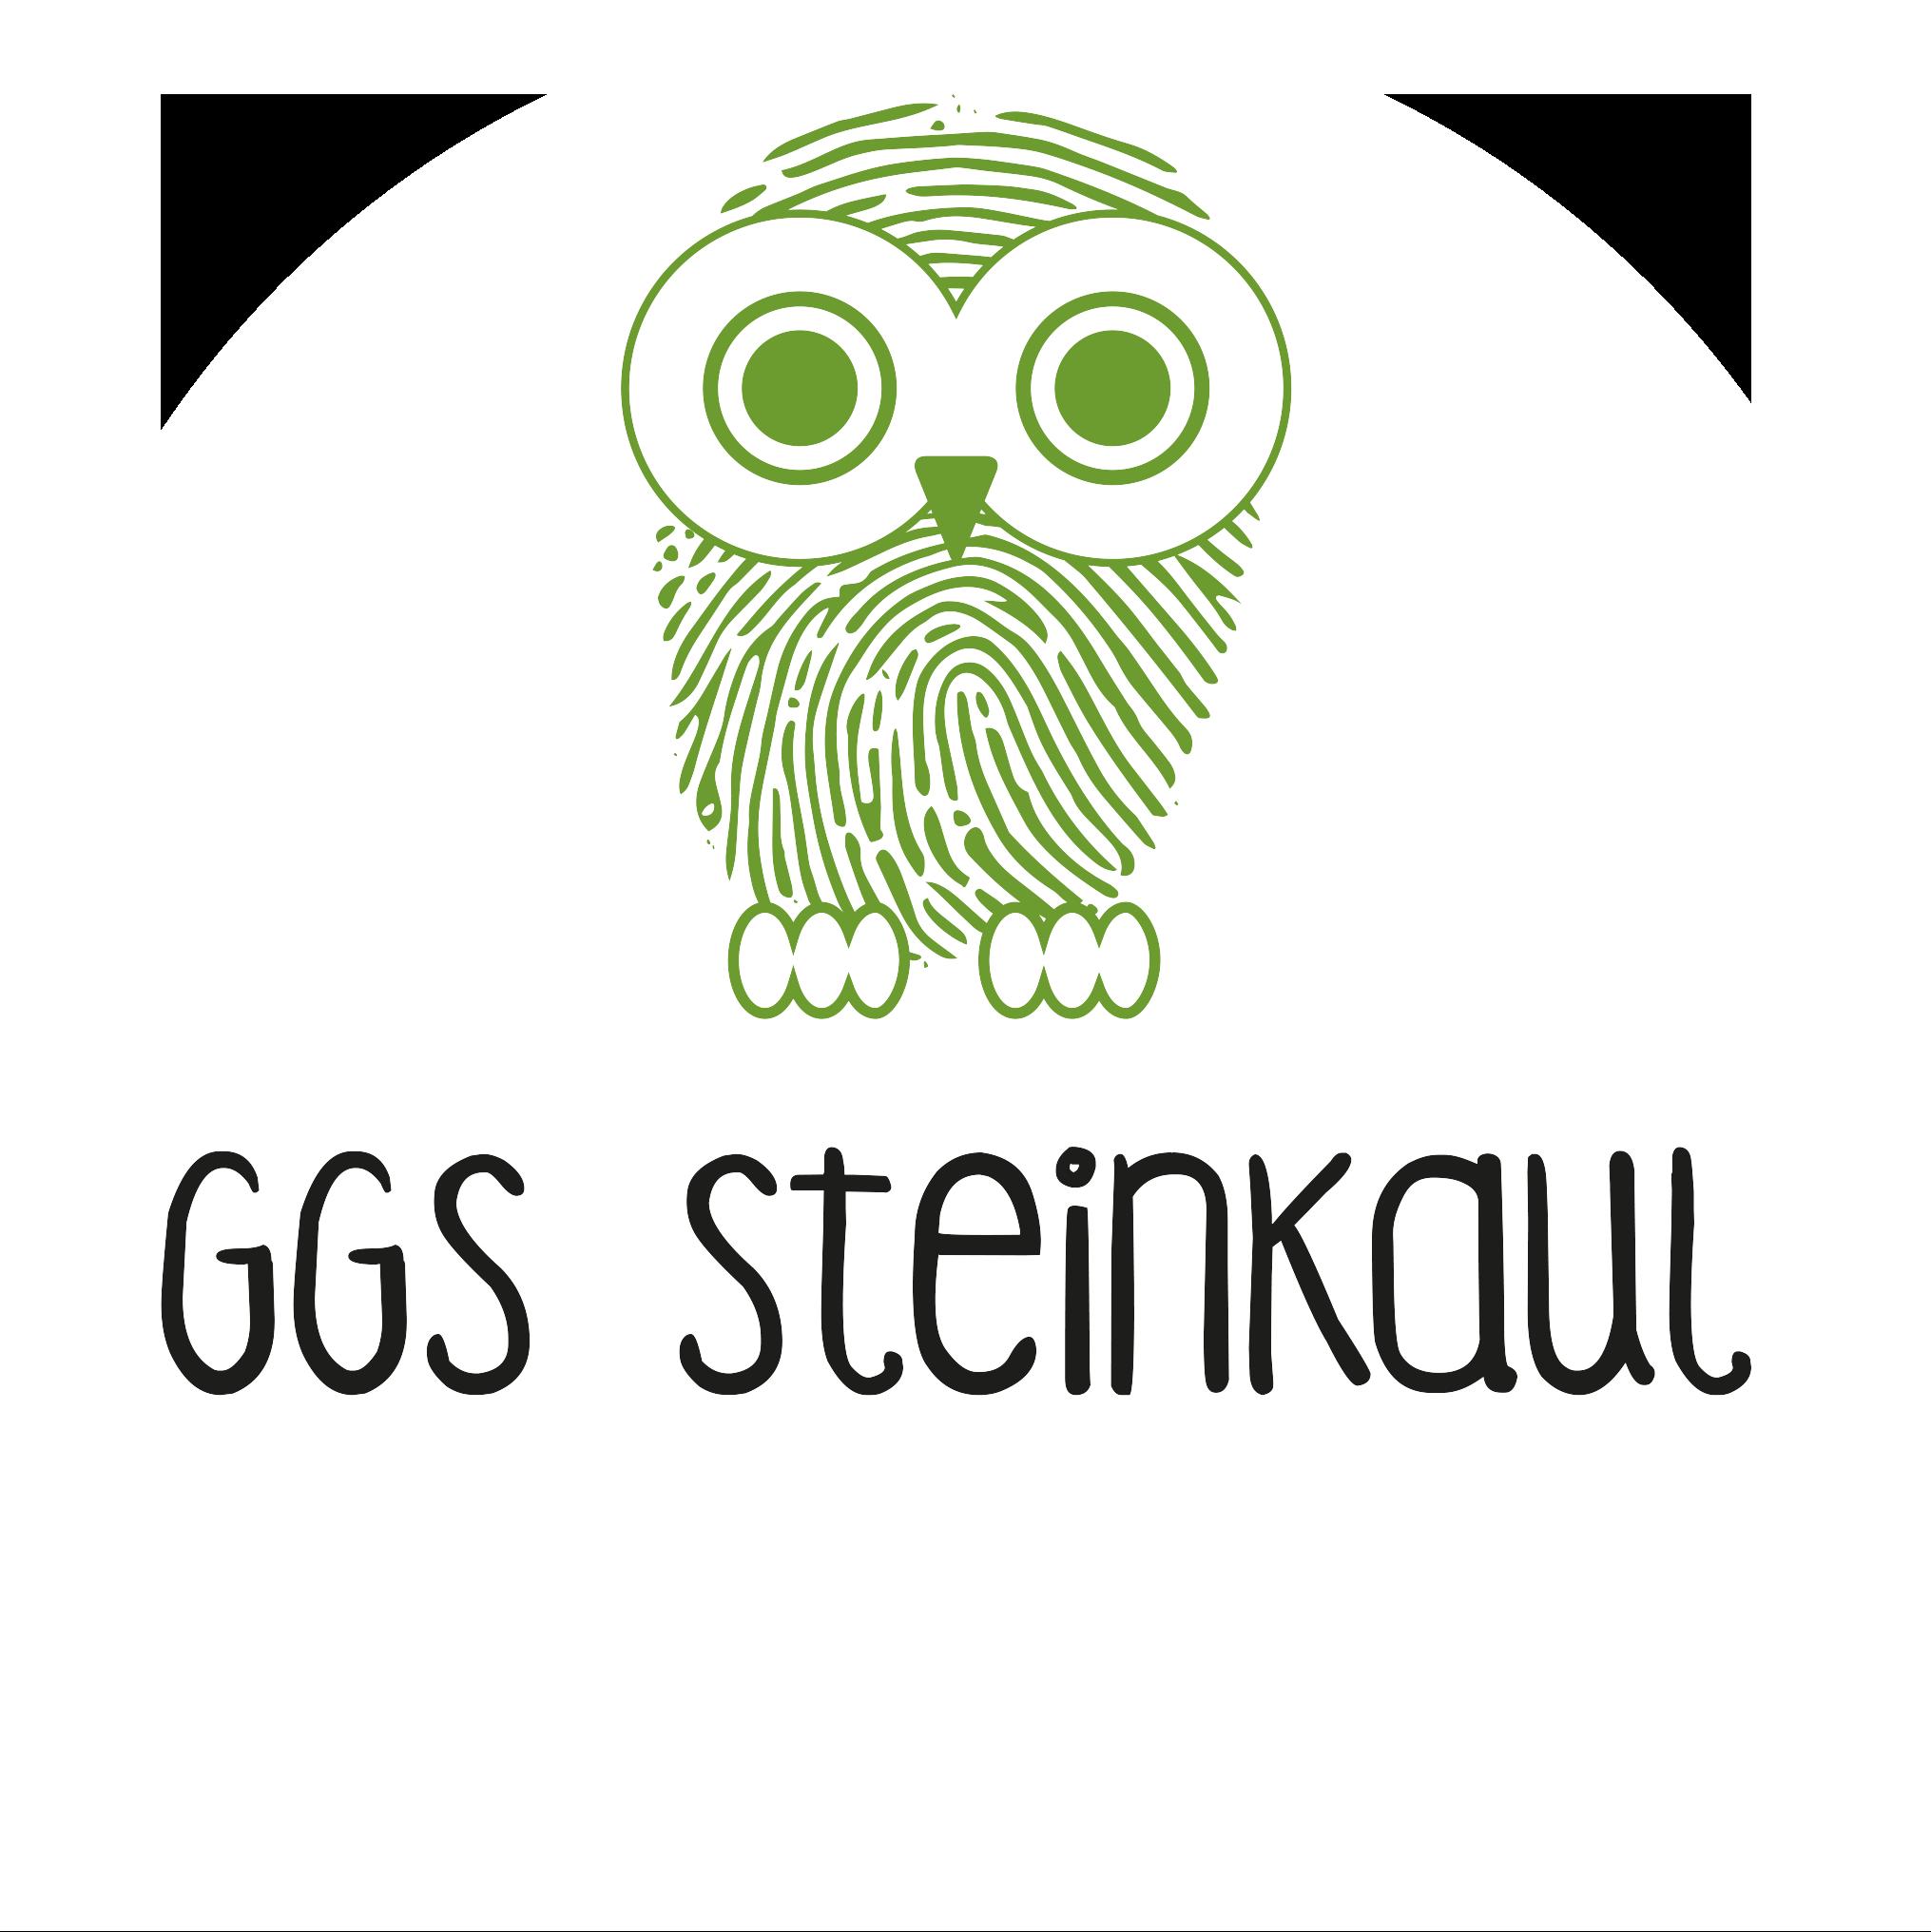 GGS Steinkaul